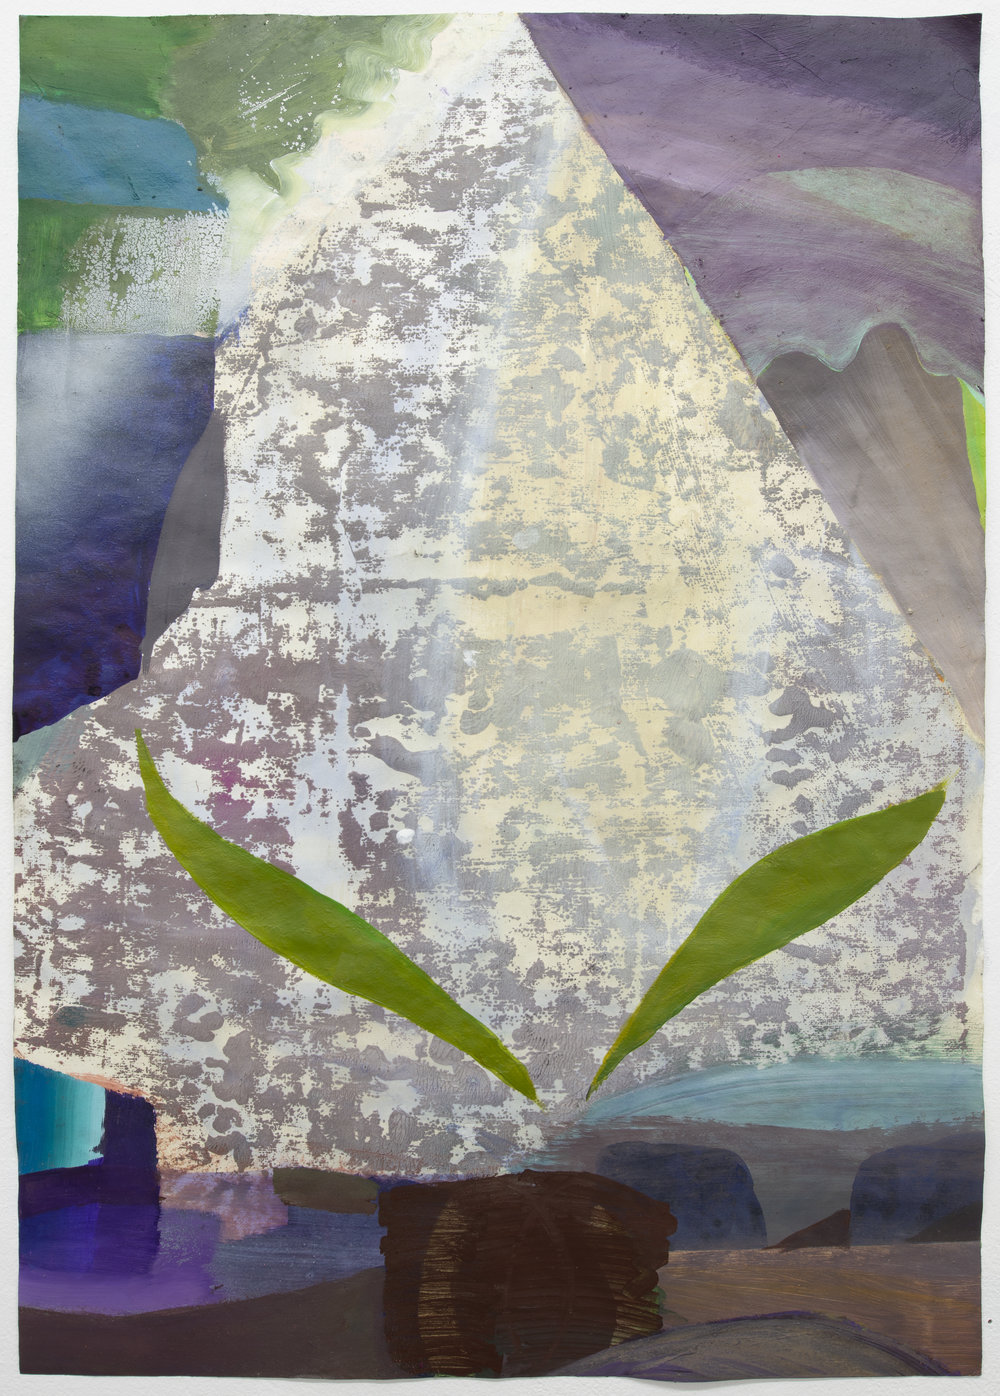 Carolin Israel  Vergissmeinnicht (Forget-me-not), 2018 Acrylic on Paper 61 x 43 cm 1.870 EUR